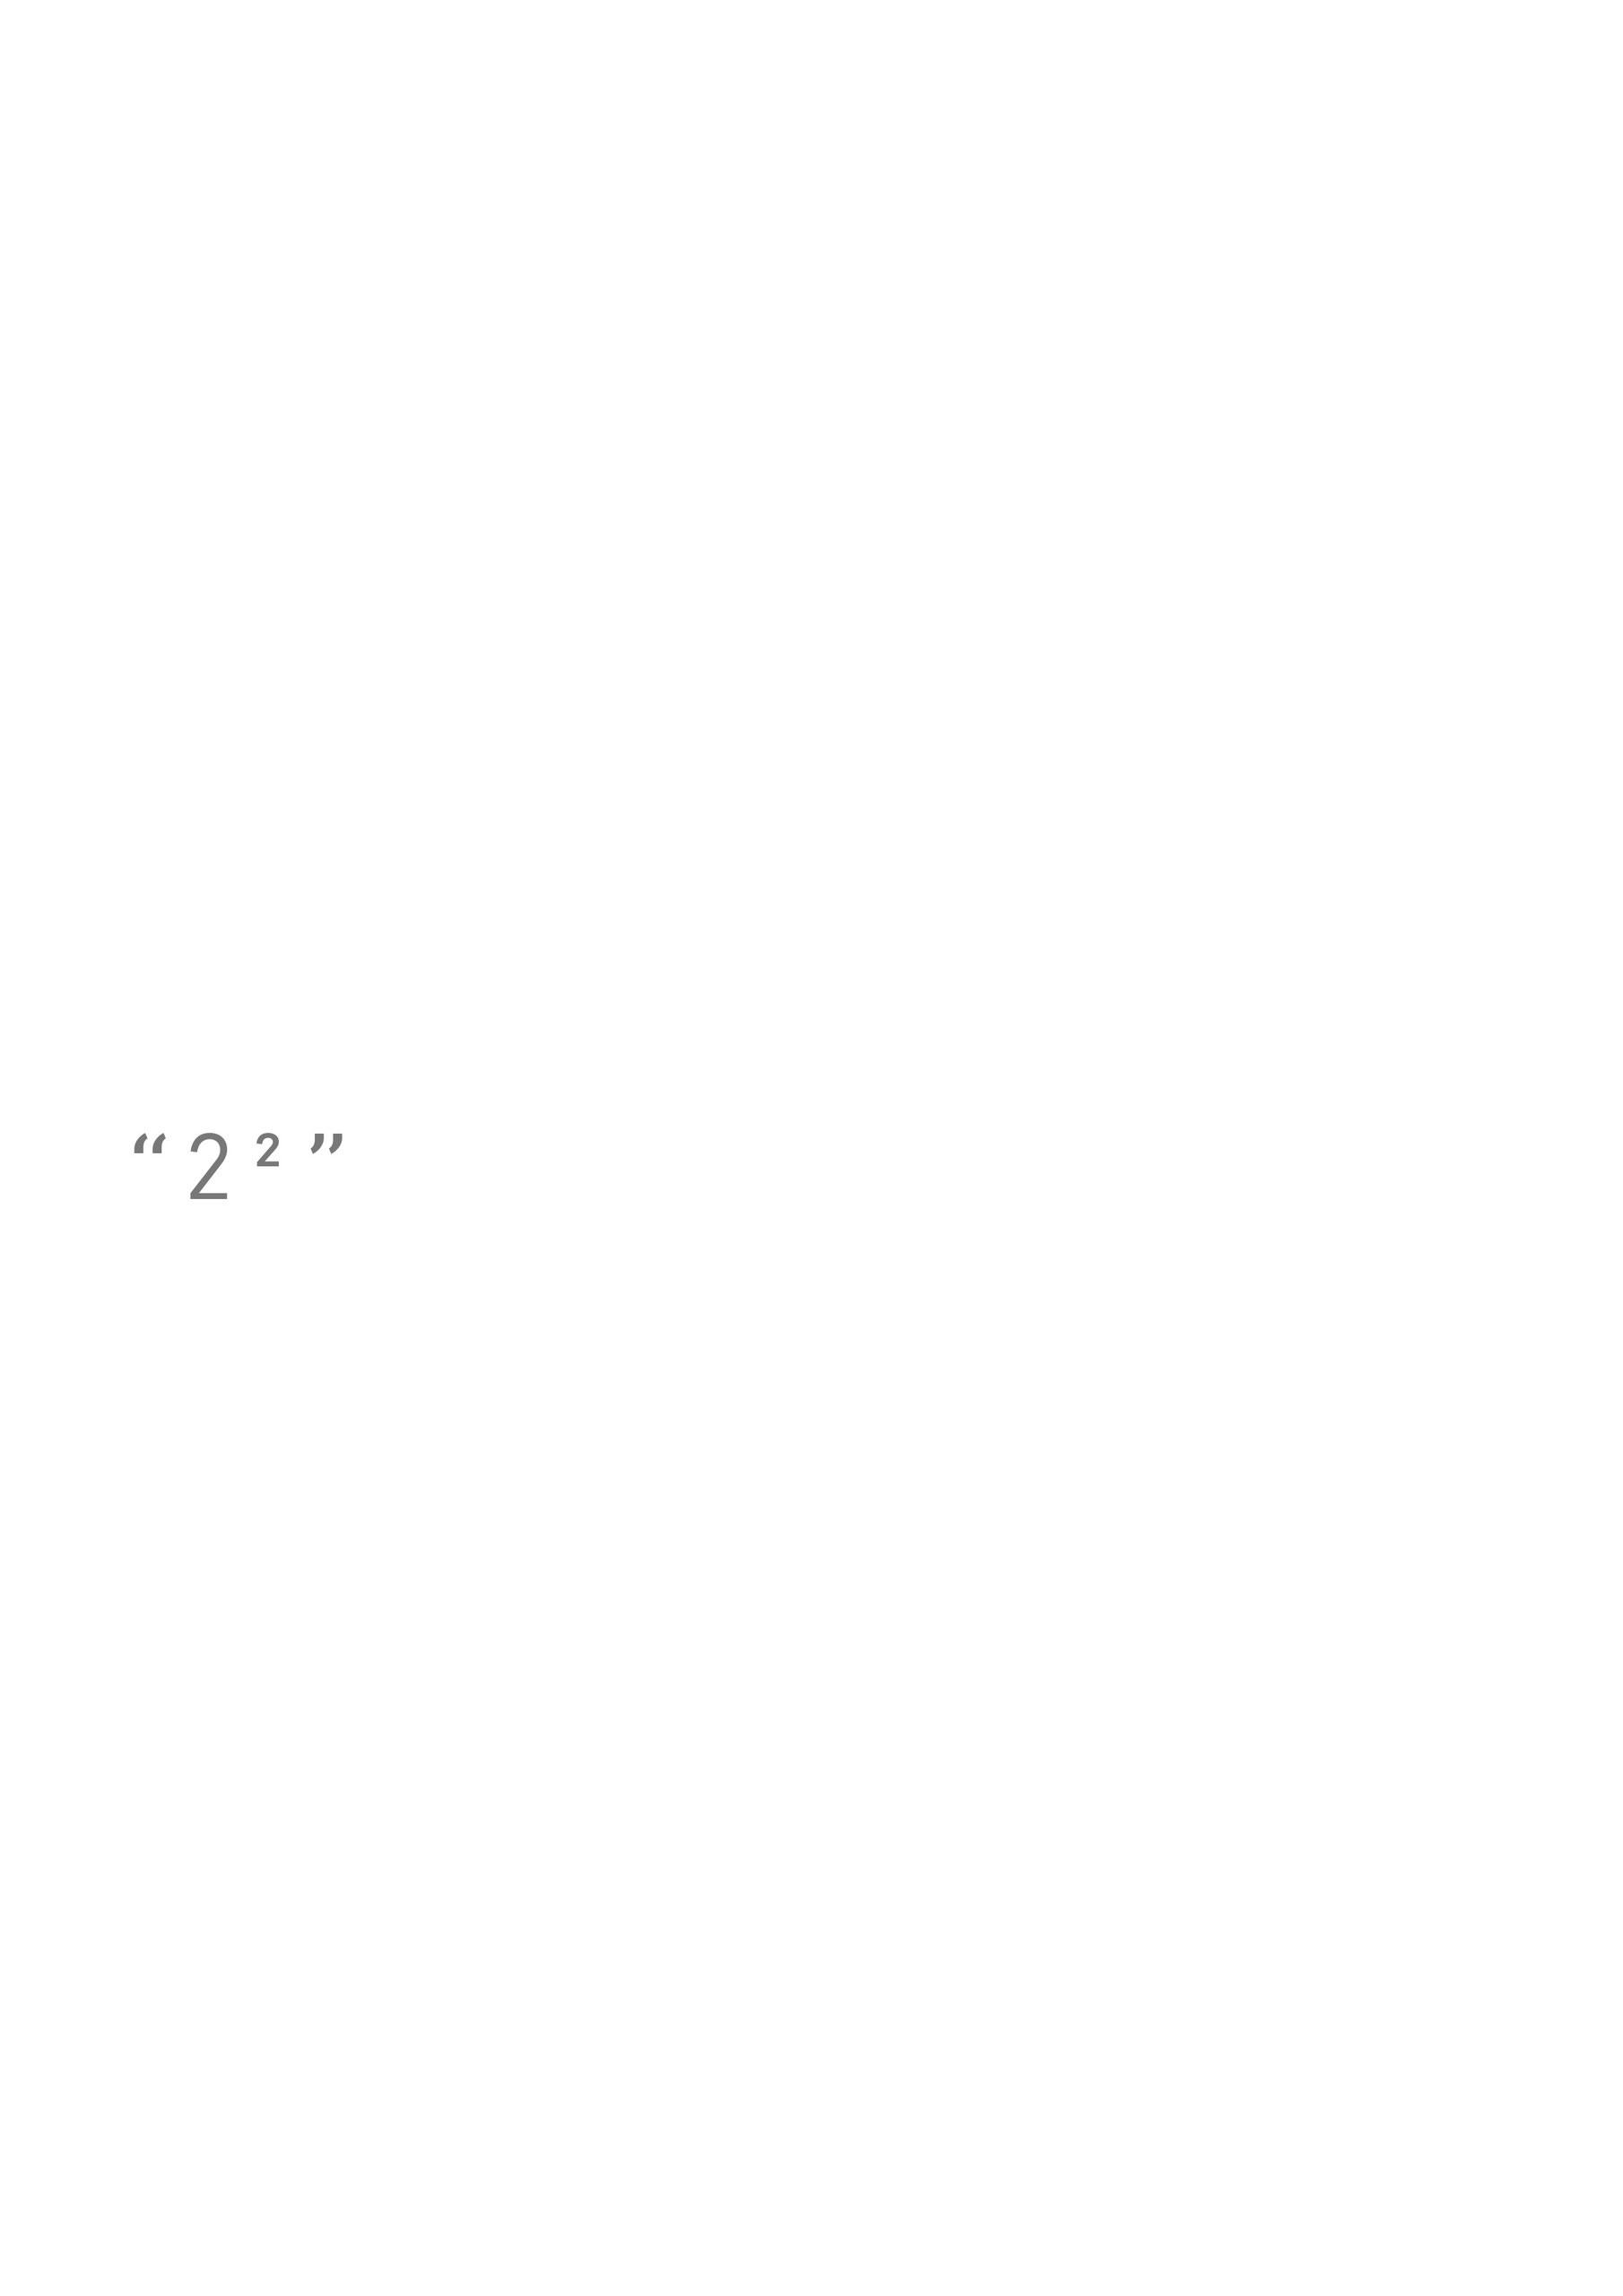 [untitled]